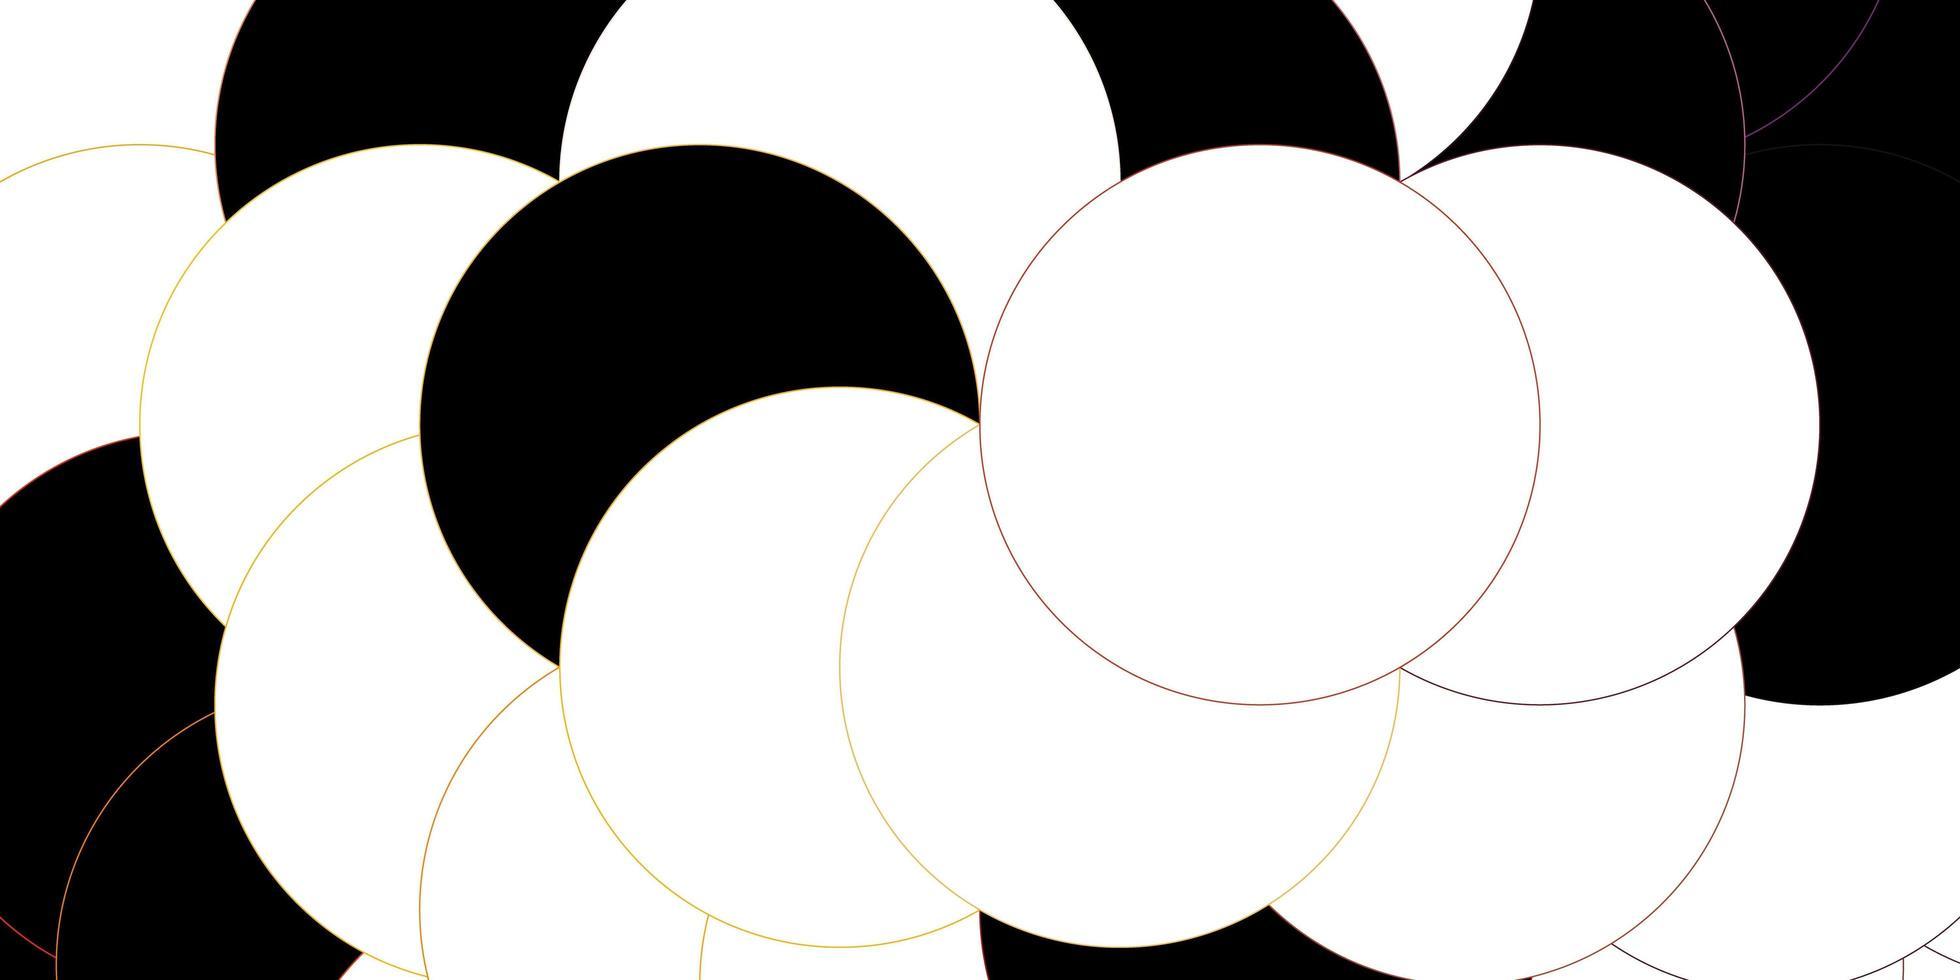 Fondo de vector de color rosa oscuro, amarillo con puntos.